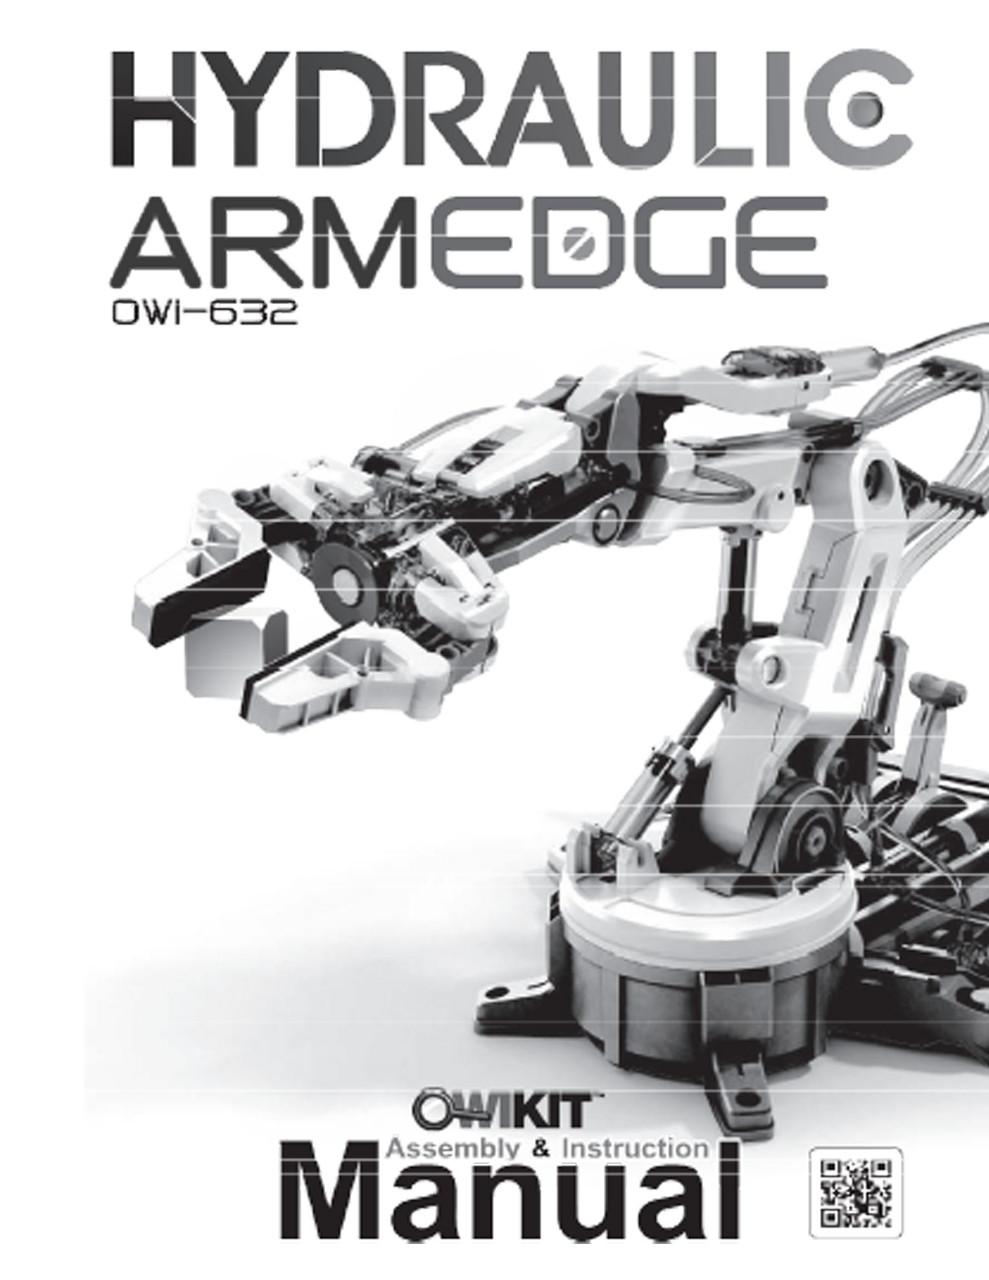 Hydraulic Loading Arms : Hydraulic arm edge manual robotikits direct